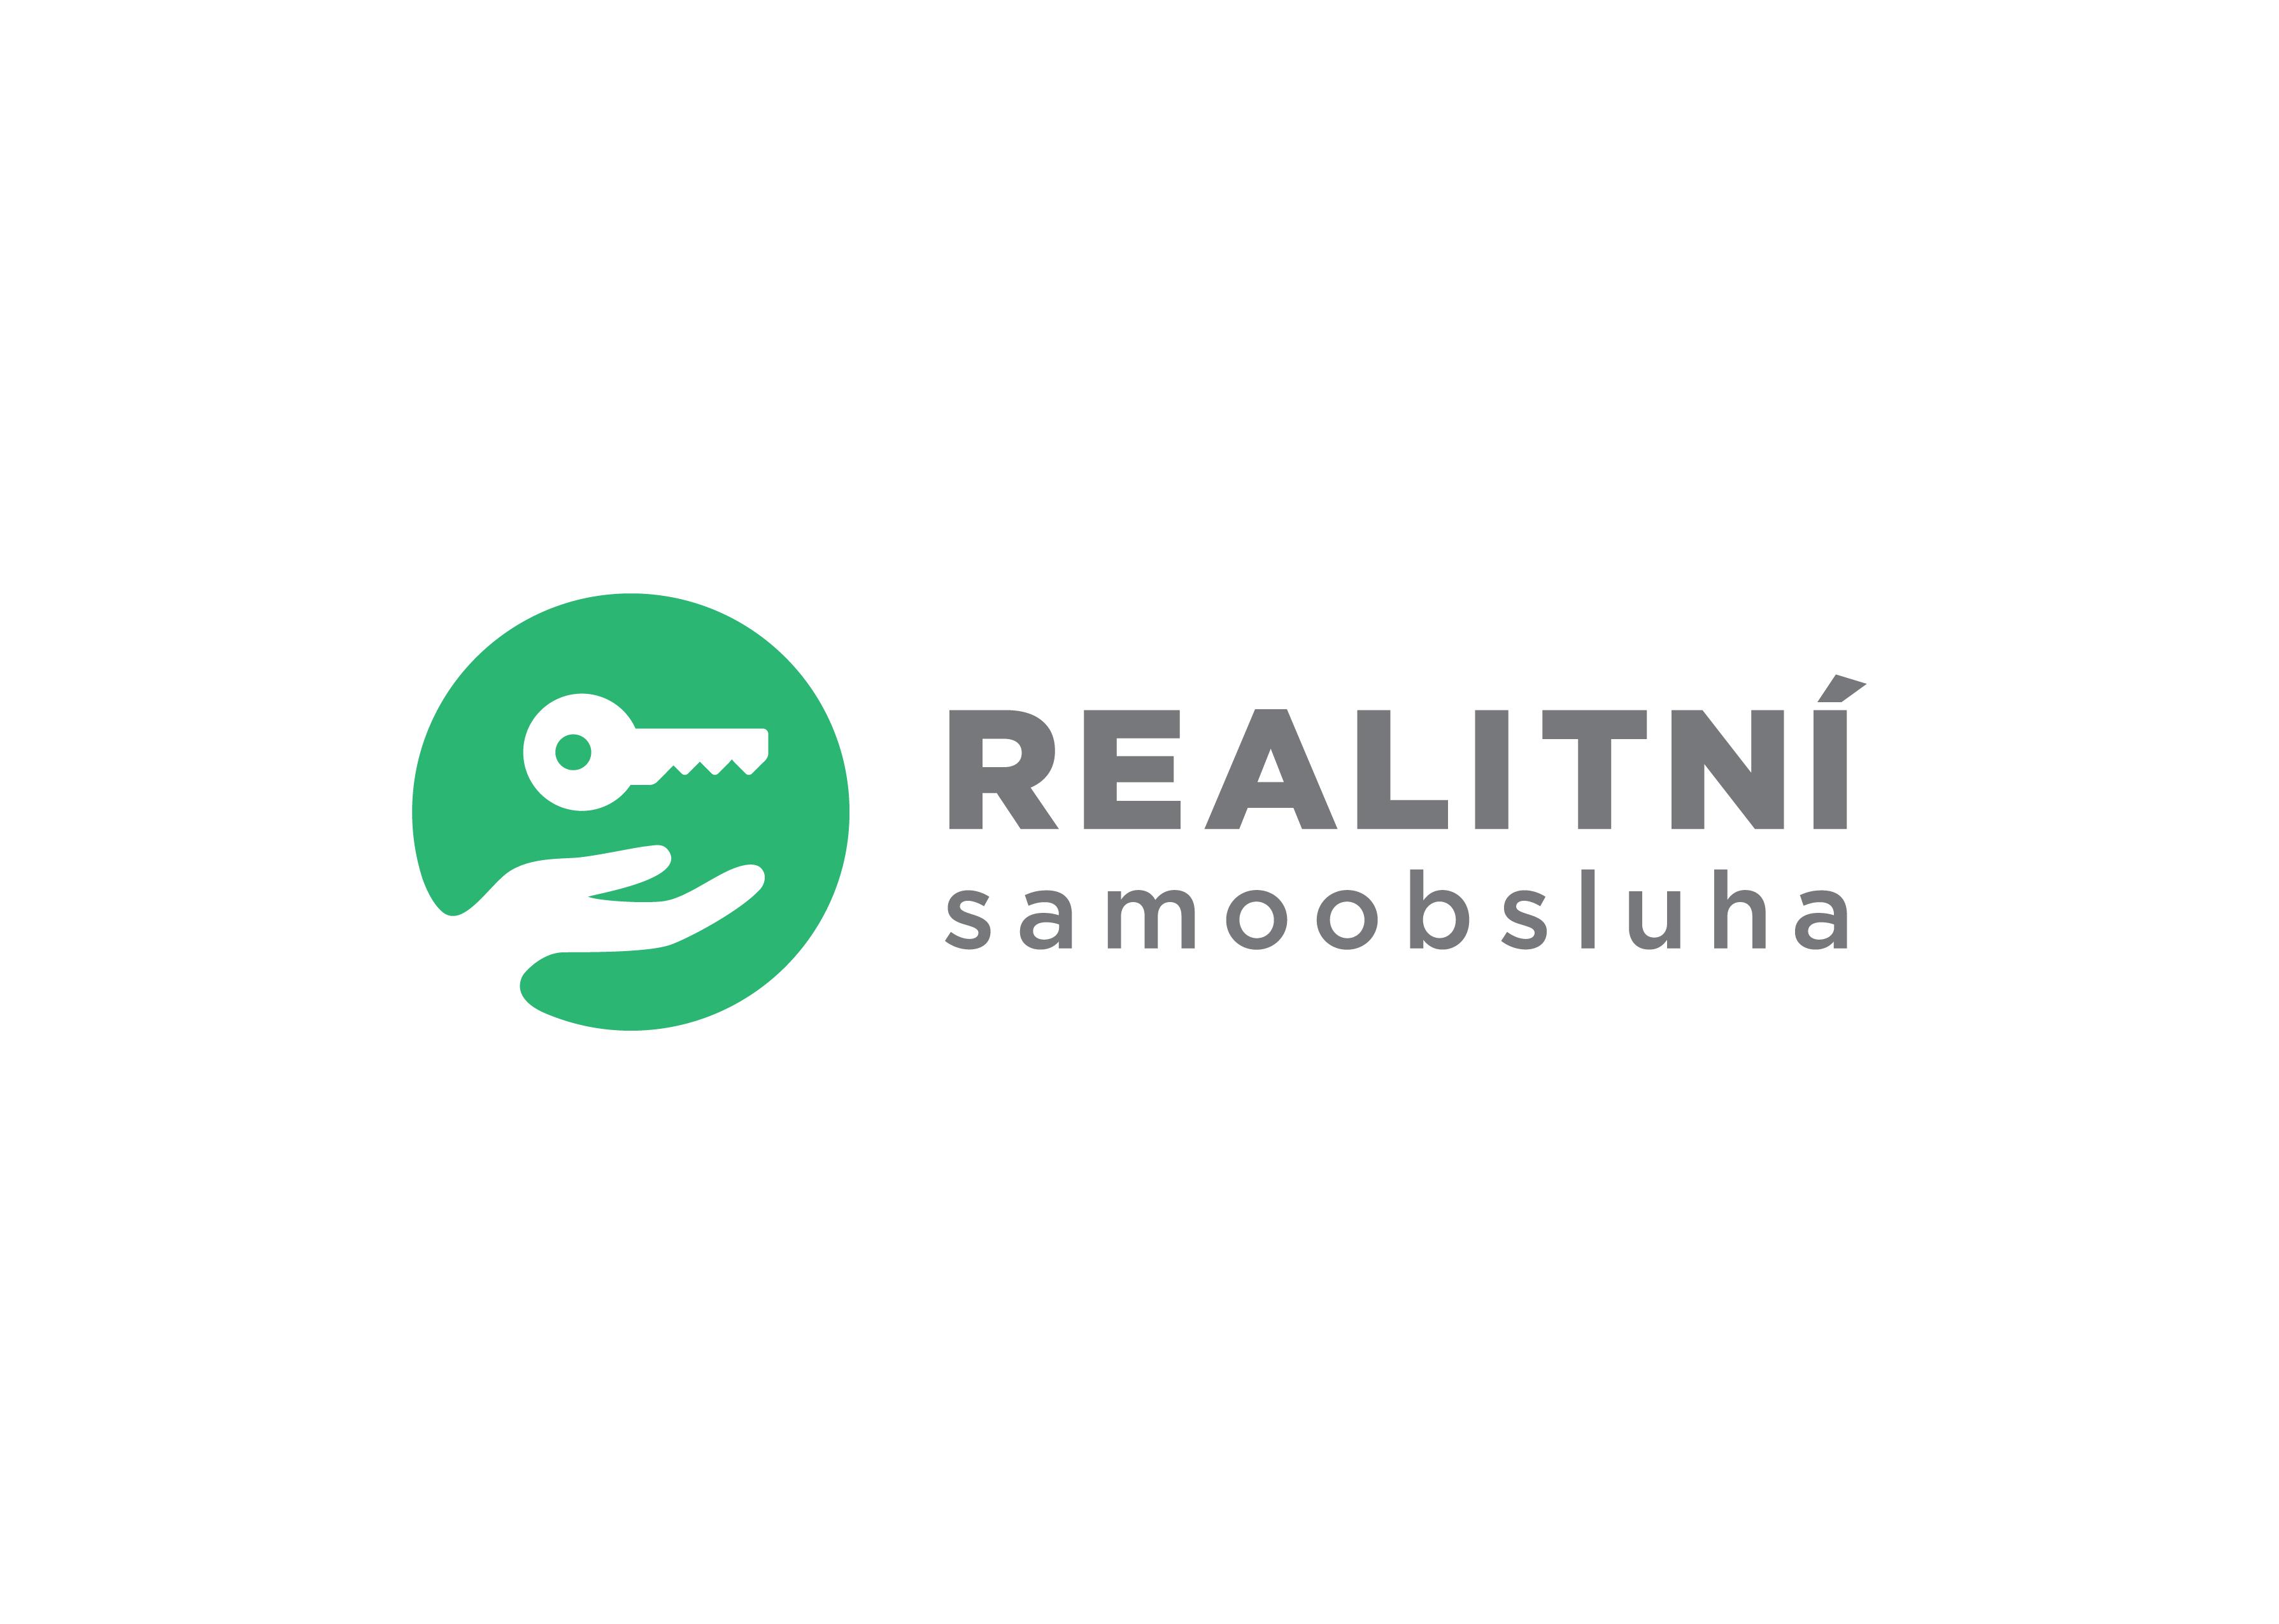 Realitní Samoobsluha s.r.o.